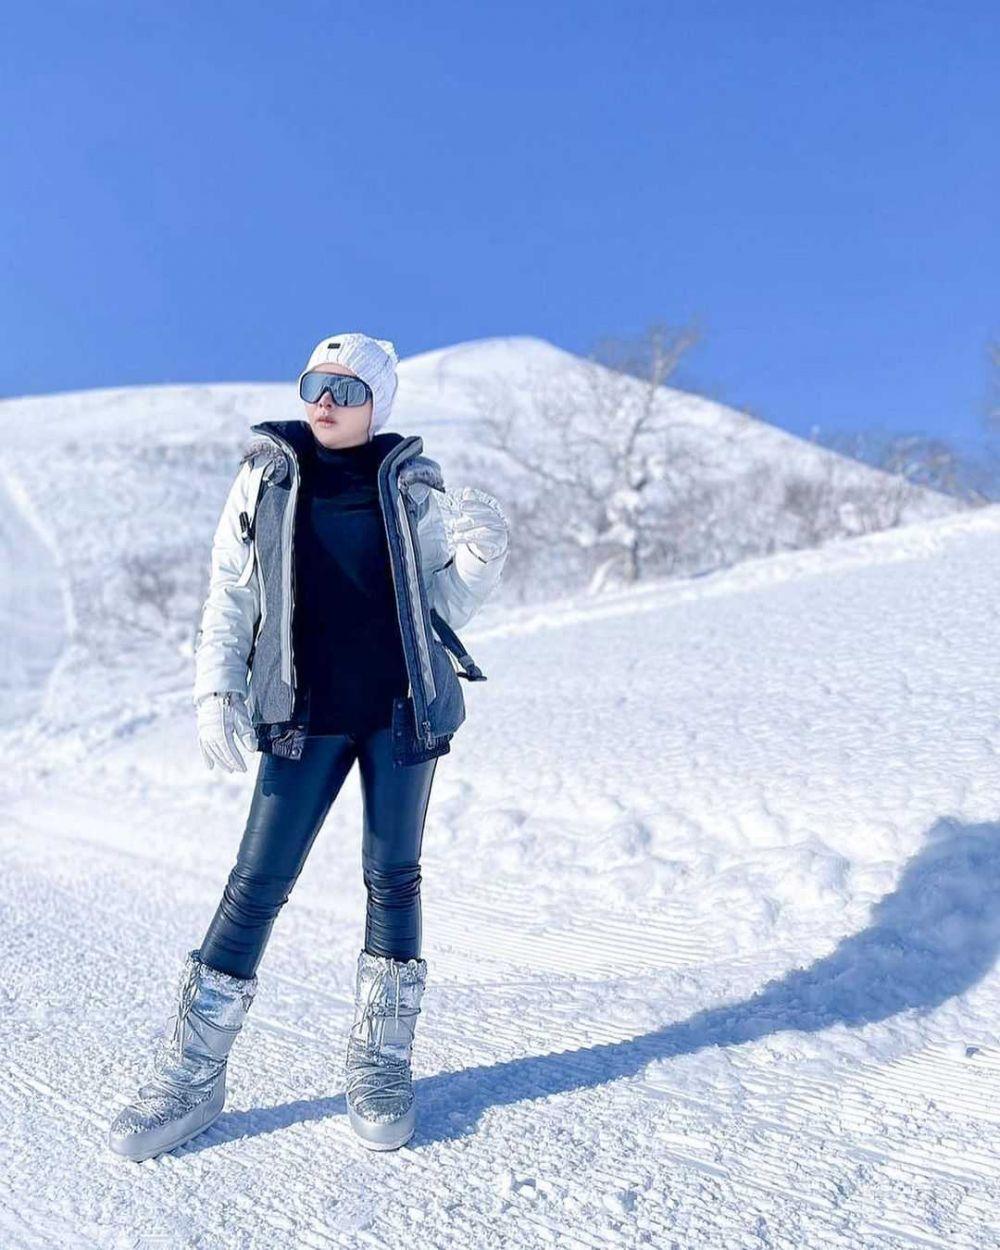 9 Potret Syahrini di Tengah Hamparan Salju, Tetap Hangat Bersama Reino